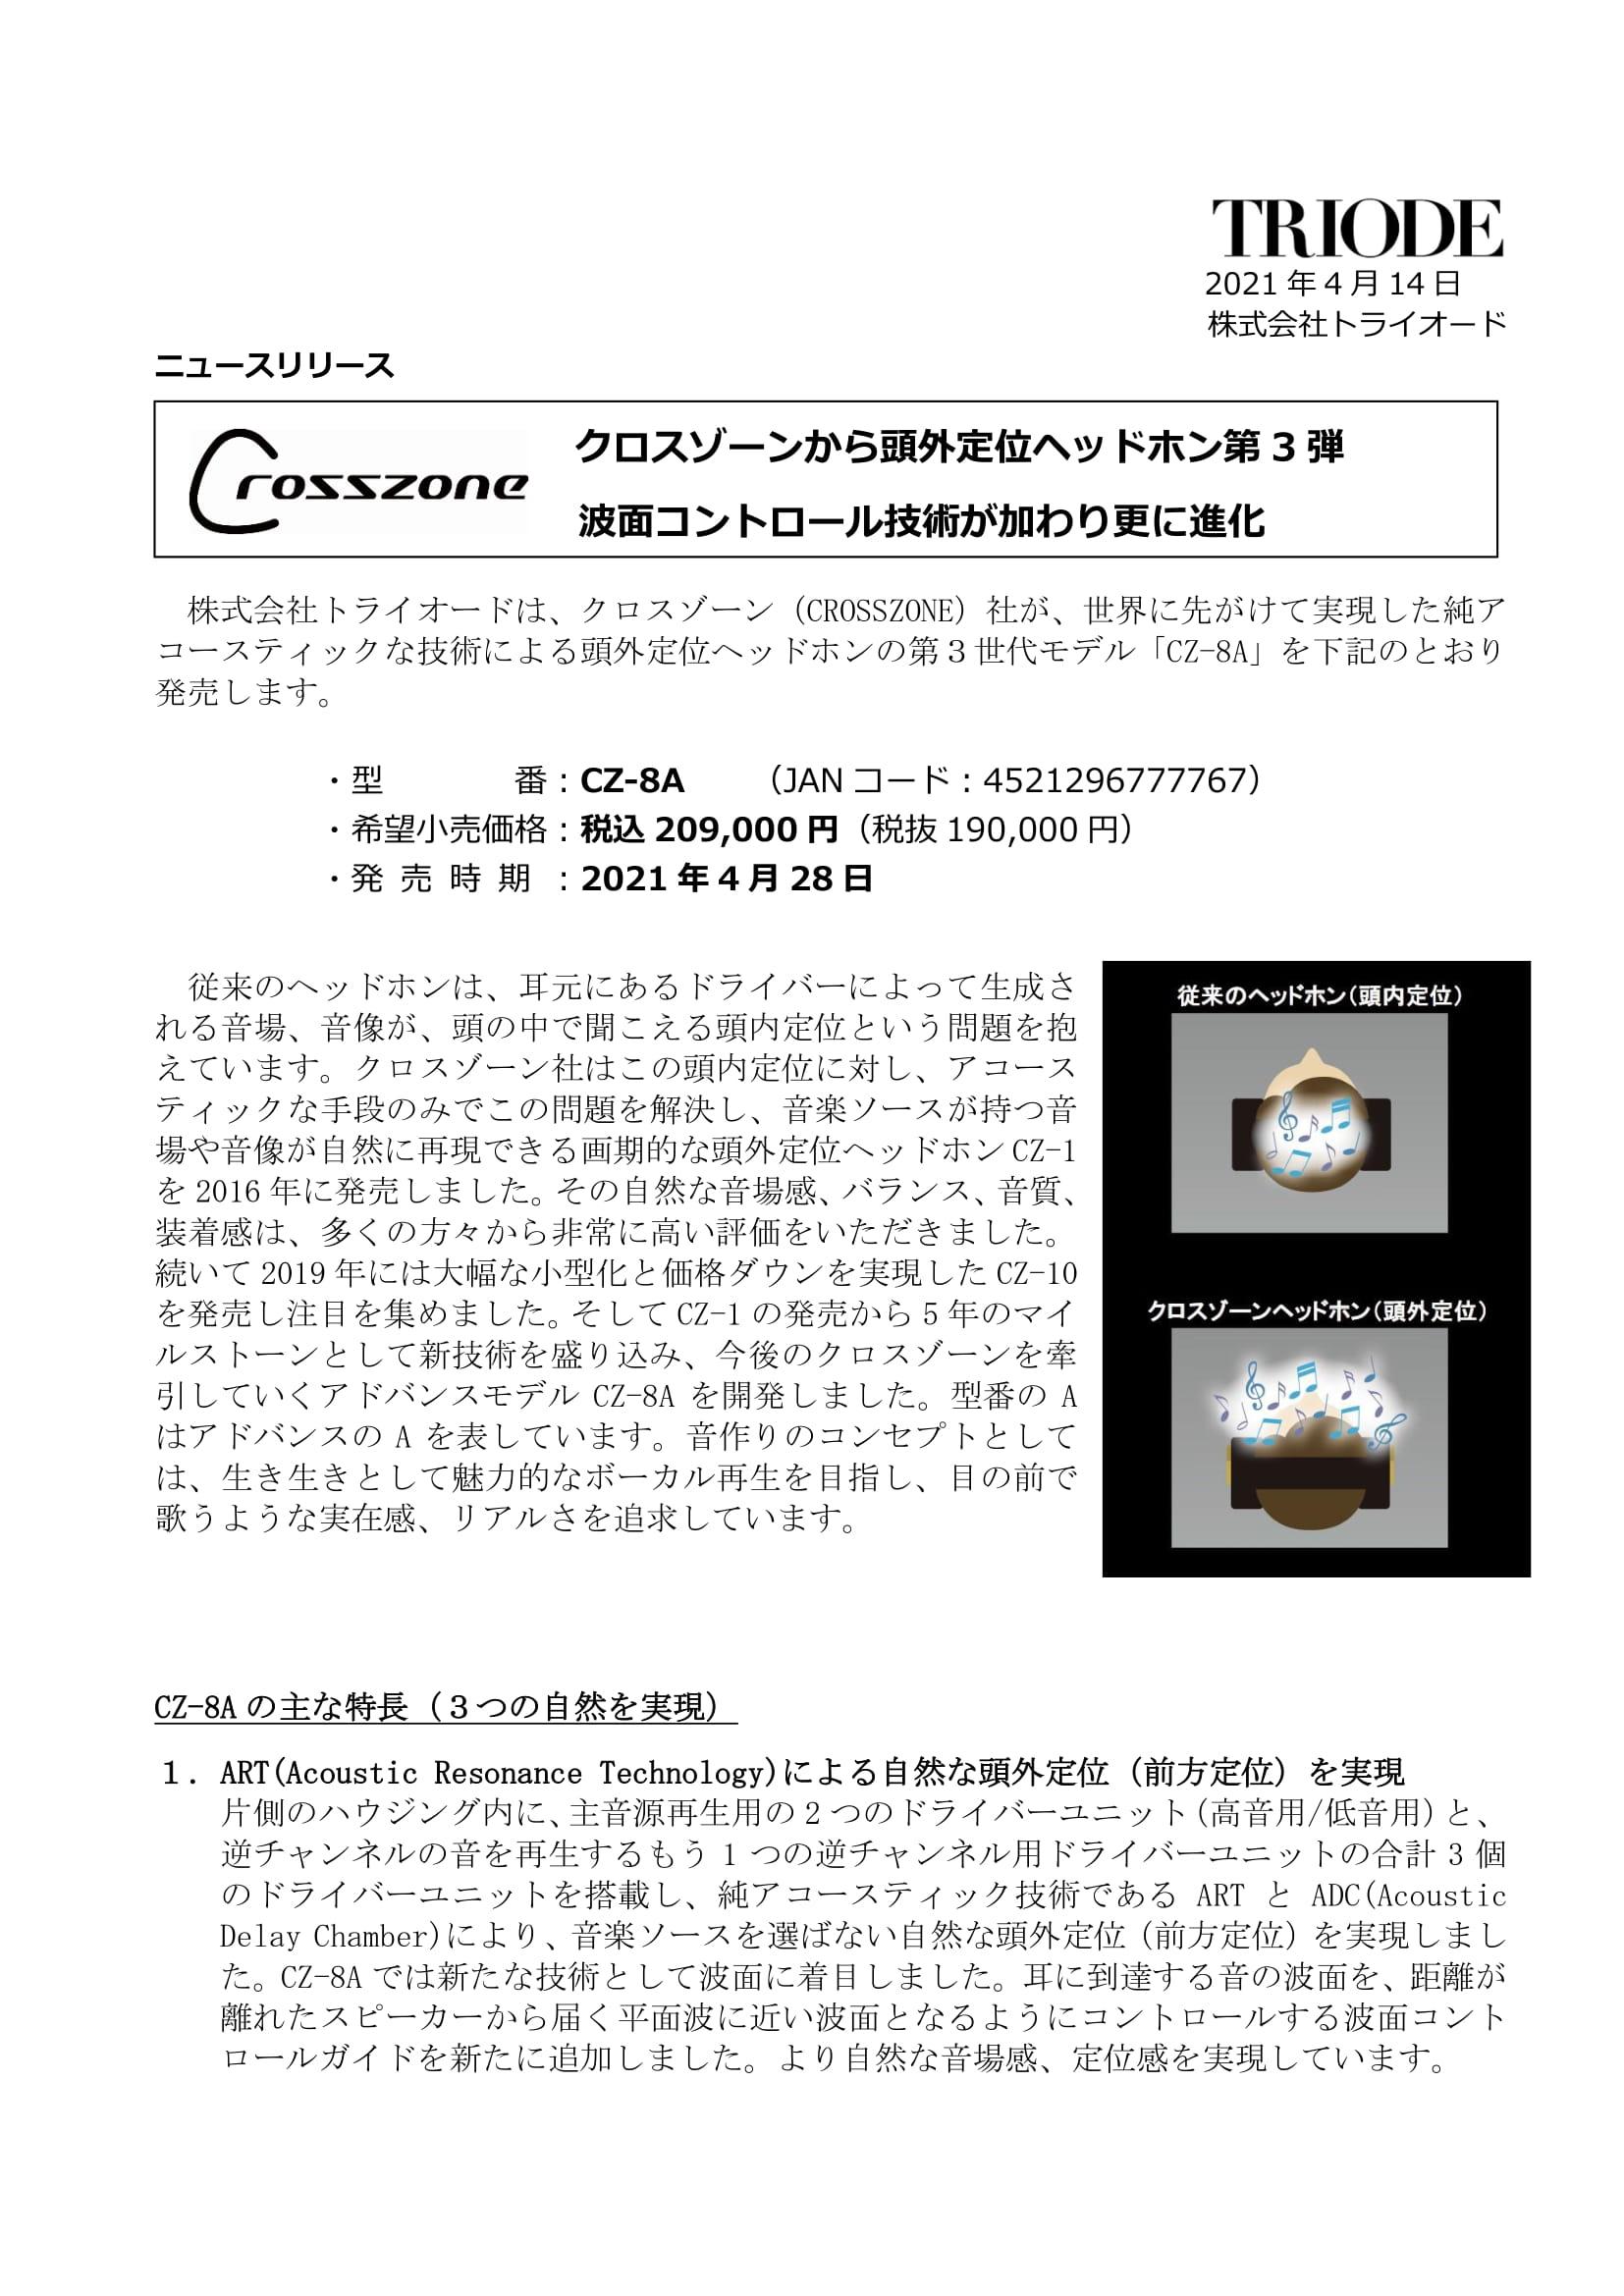 CROSSZONE CZ-8Aニュースリリース210414-1